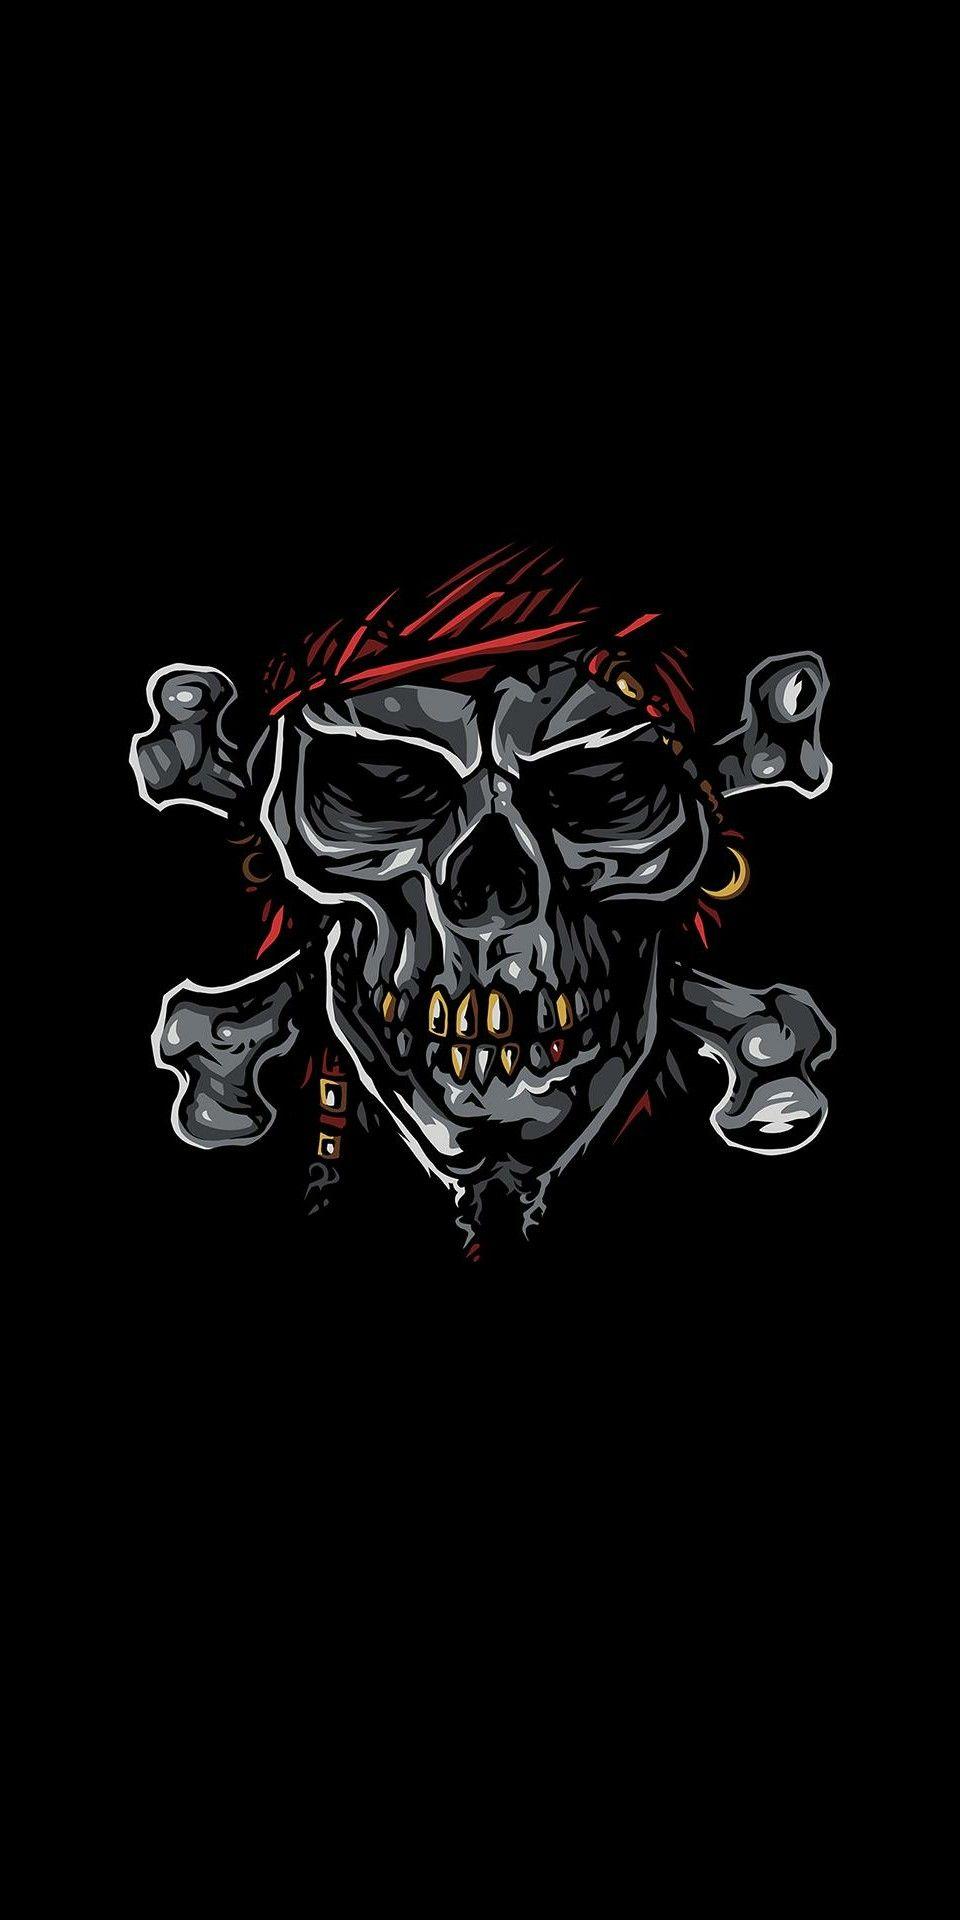 Pirates Cool Wallpaper Mobile Wallpaper Wallpaper Backgrounds Phone Backgrounds Skull Island